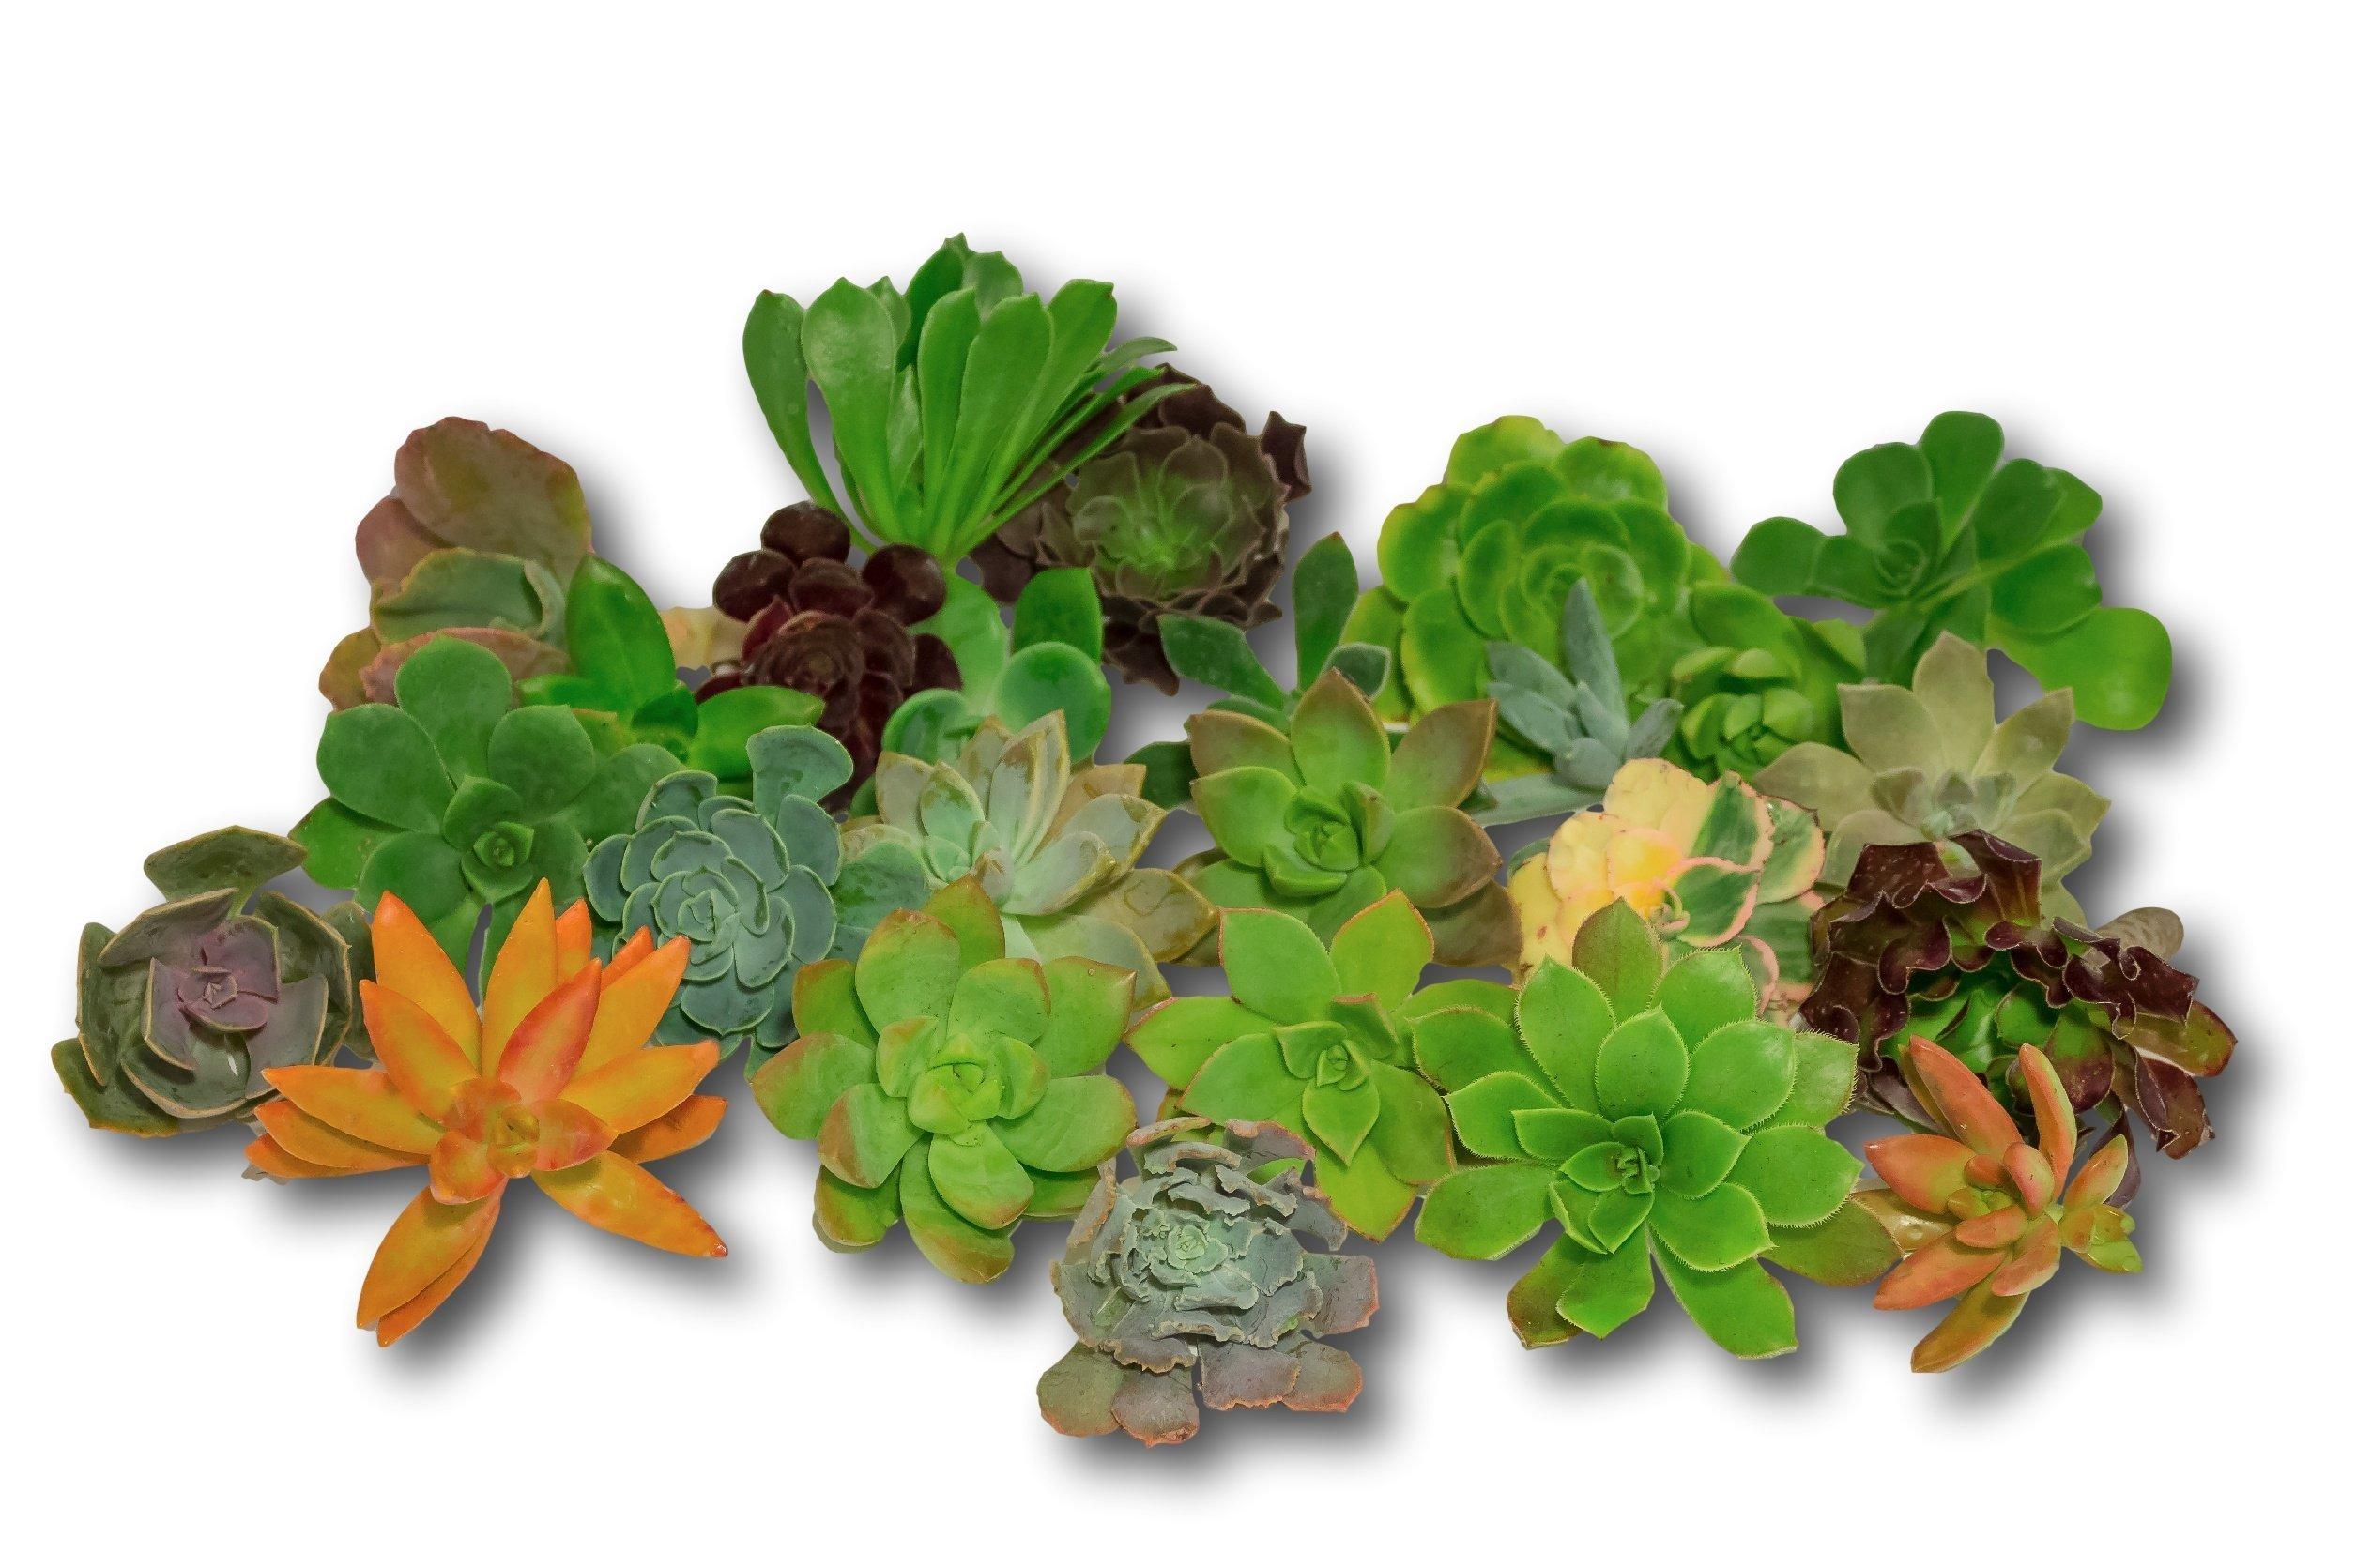 Fat Plants San Diego Gorgeous All Rosette Succulent Cuttings (25)